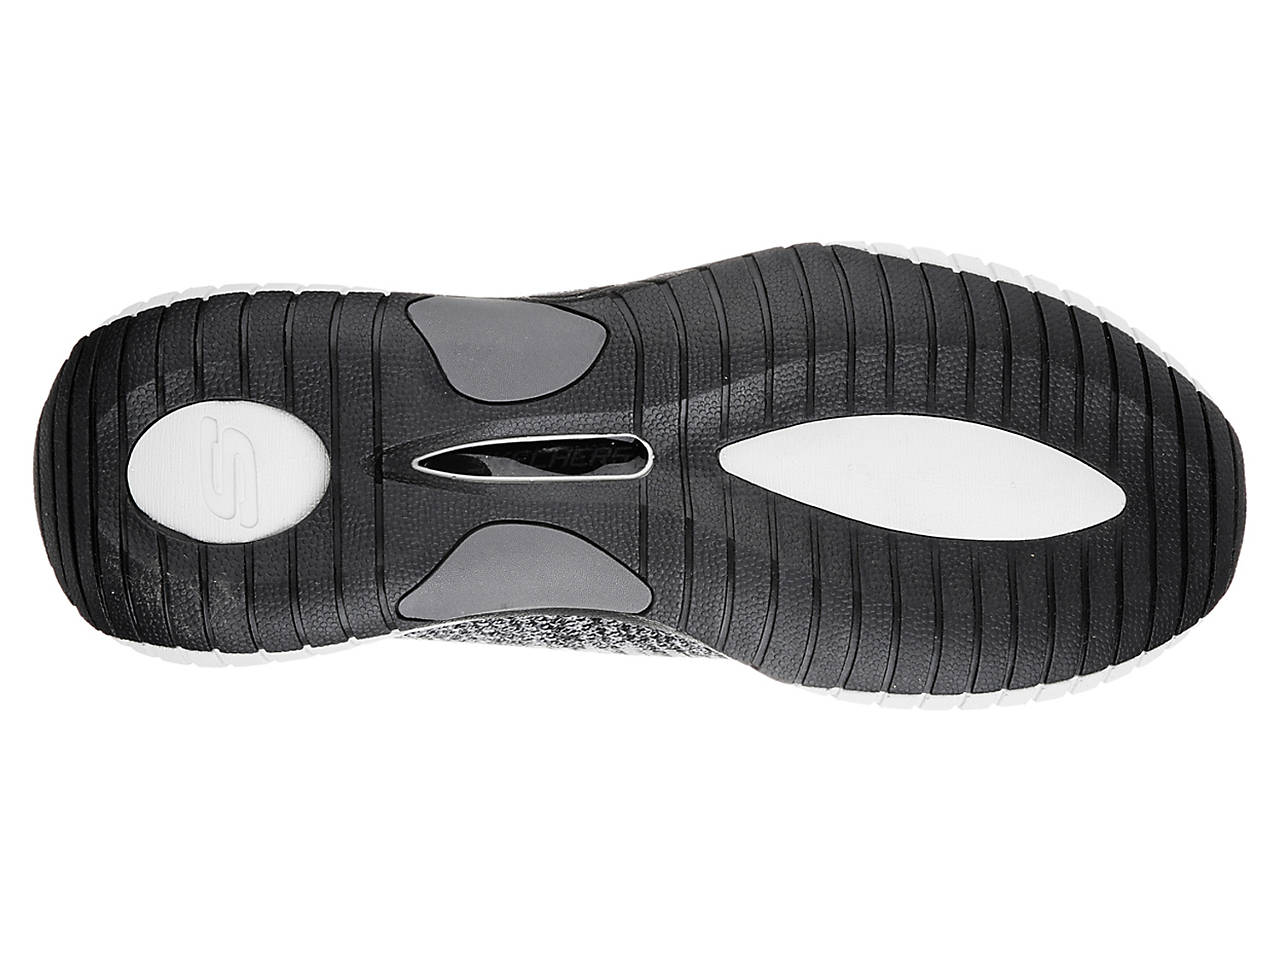 5c62ed1c8fd99 Skechers Classic Fit Sendro Malego Sneaker Men s Shoes